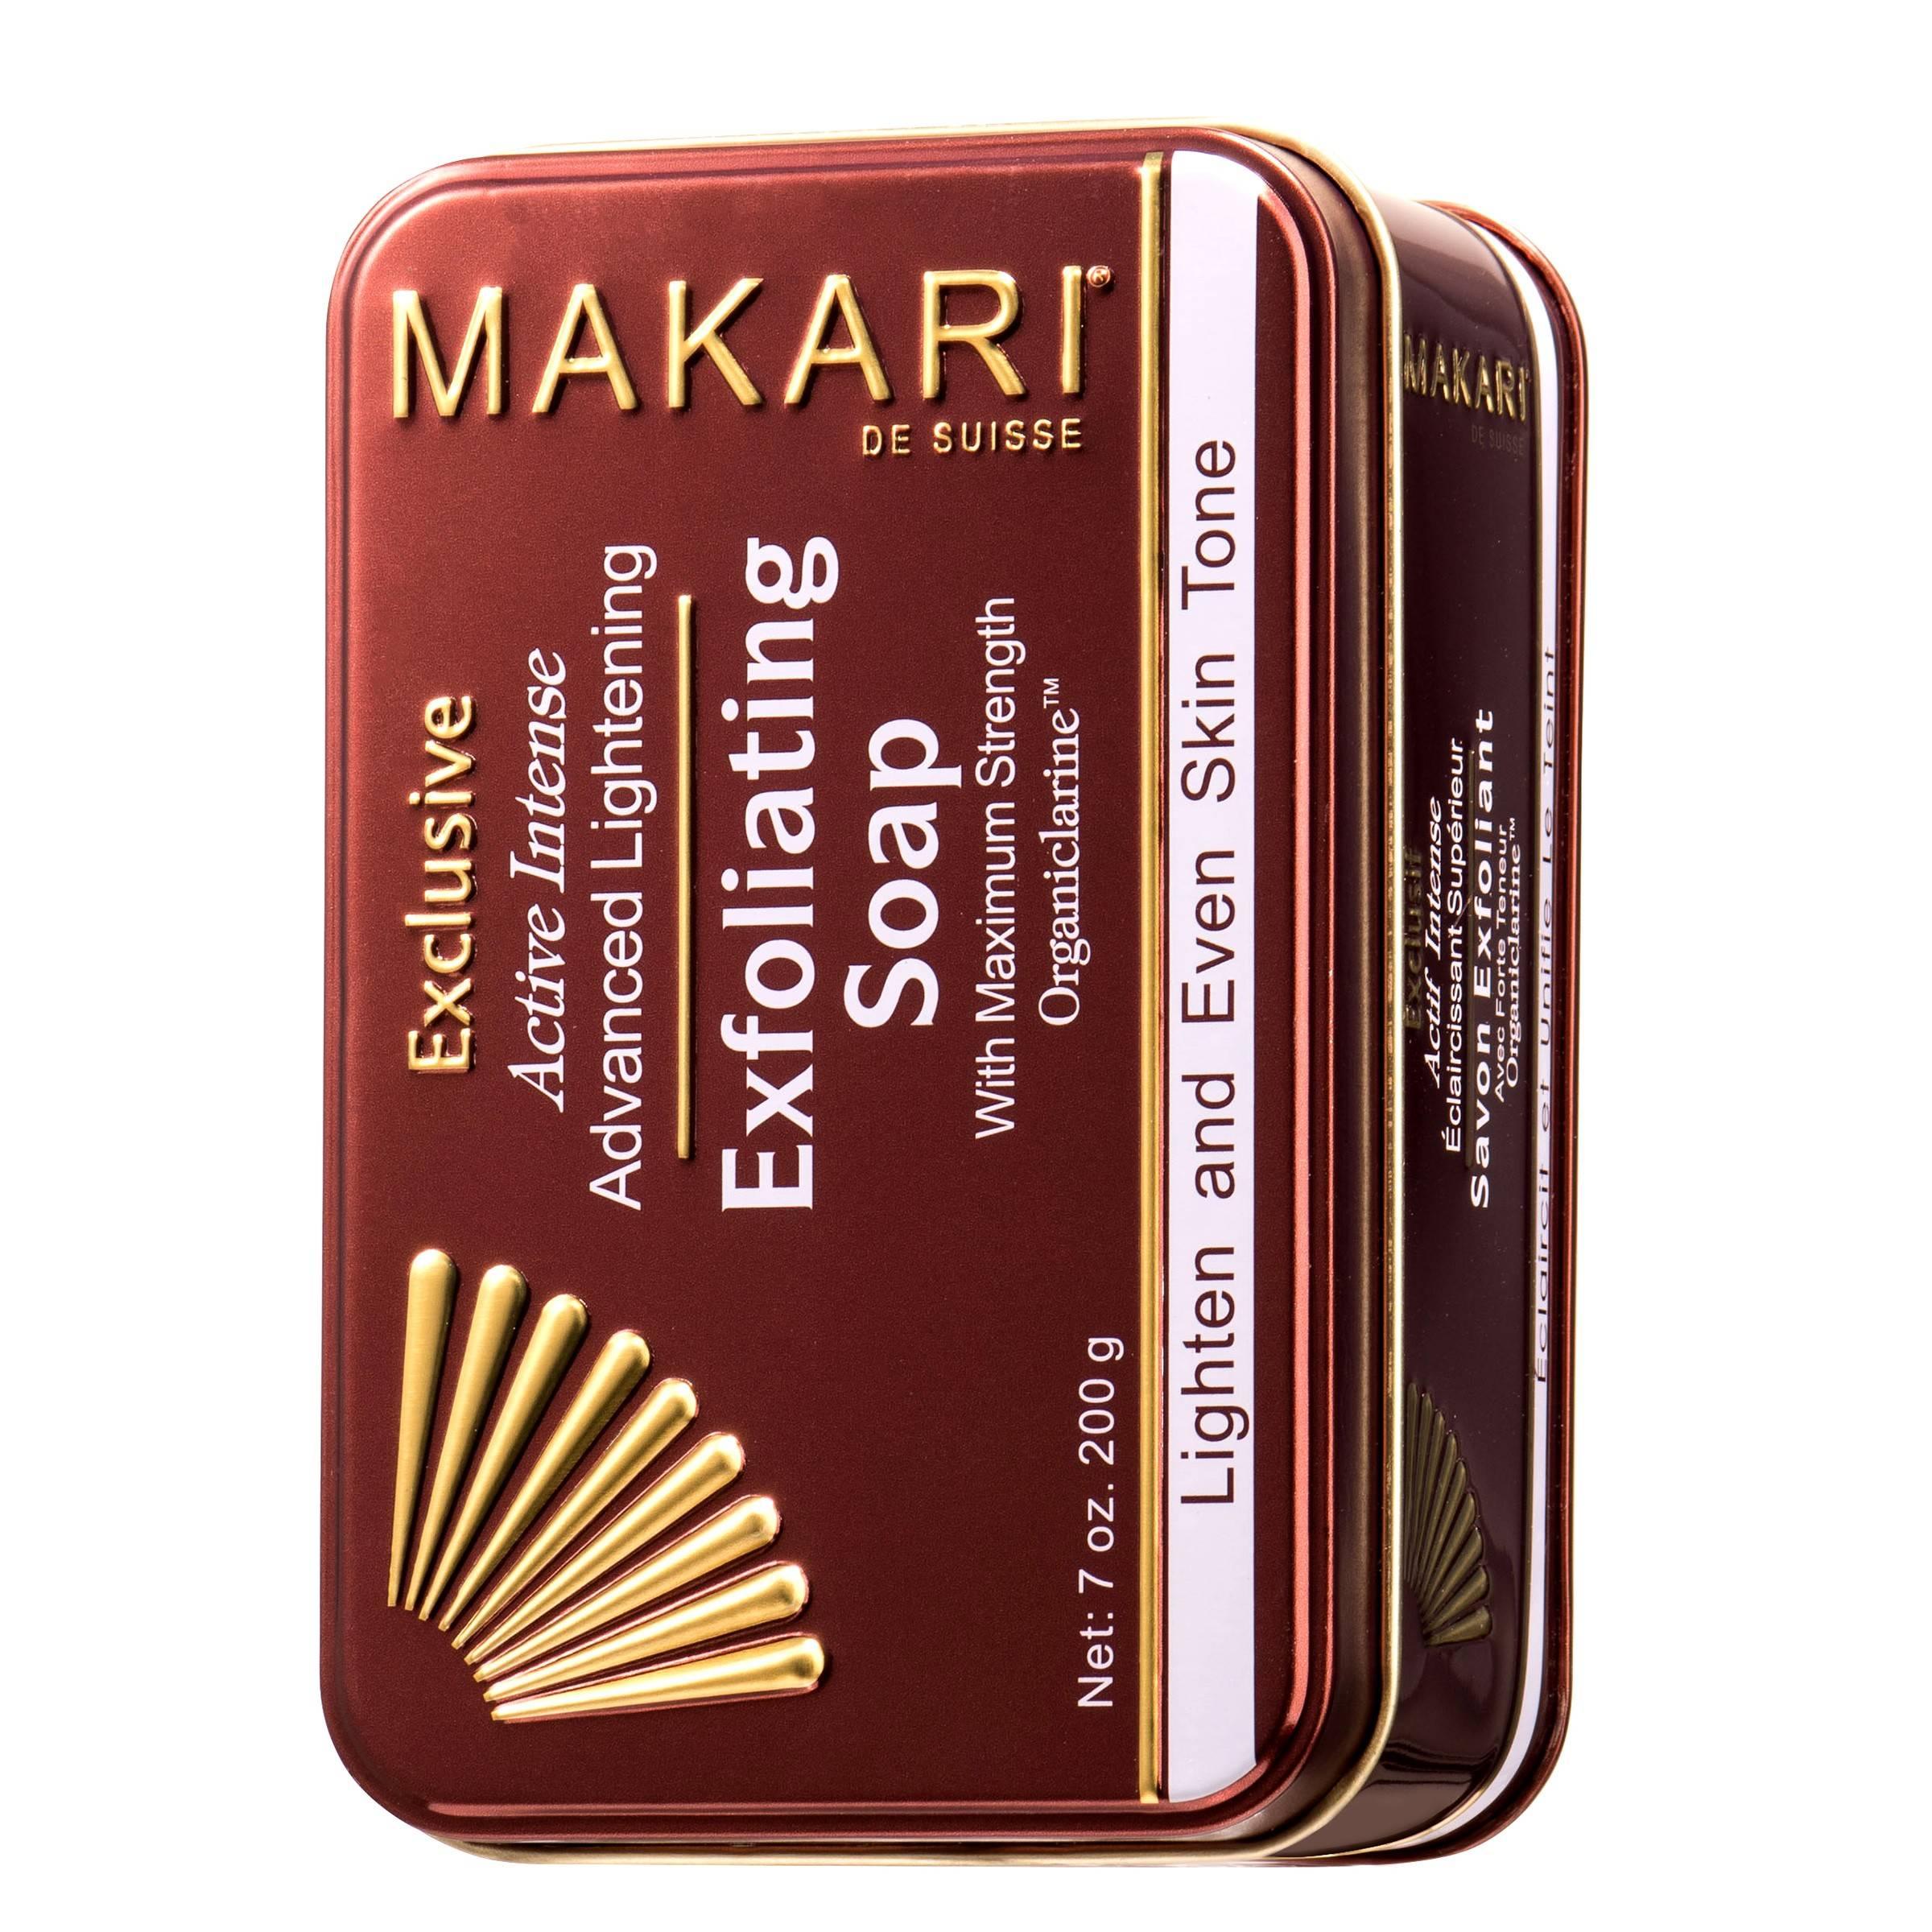 Makari EXCLUSIVE ACTIVE INTENSE EXFOLIATING SOAP 7oz